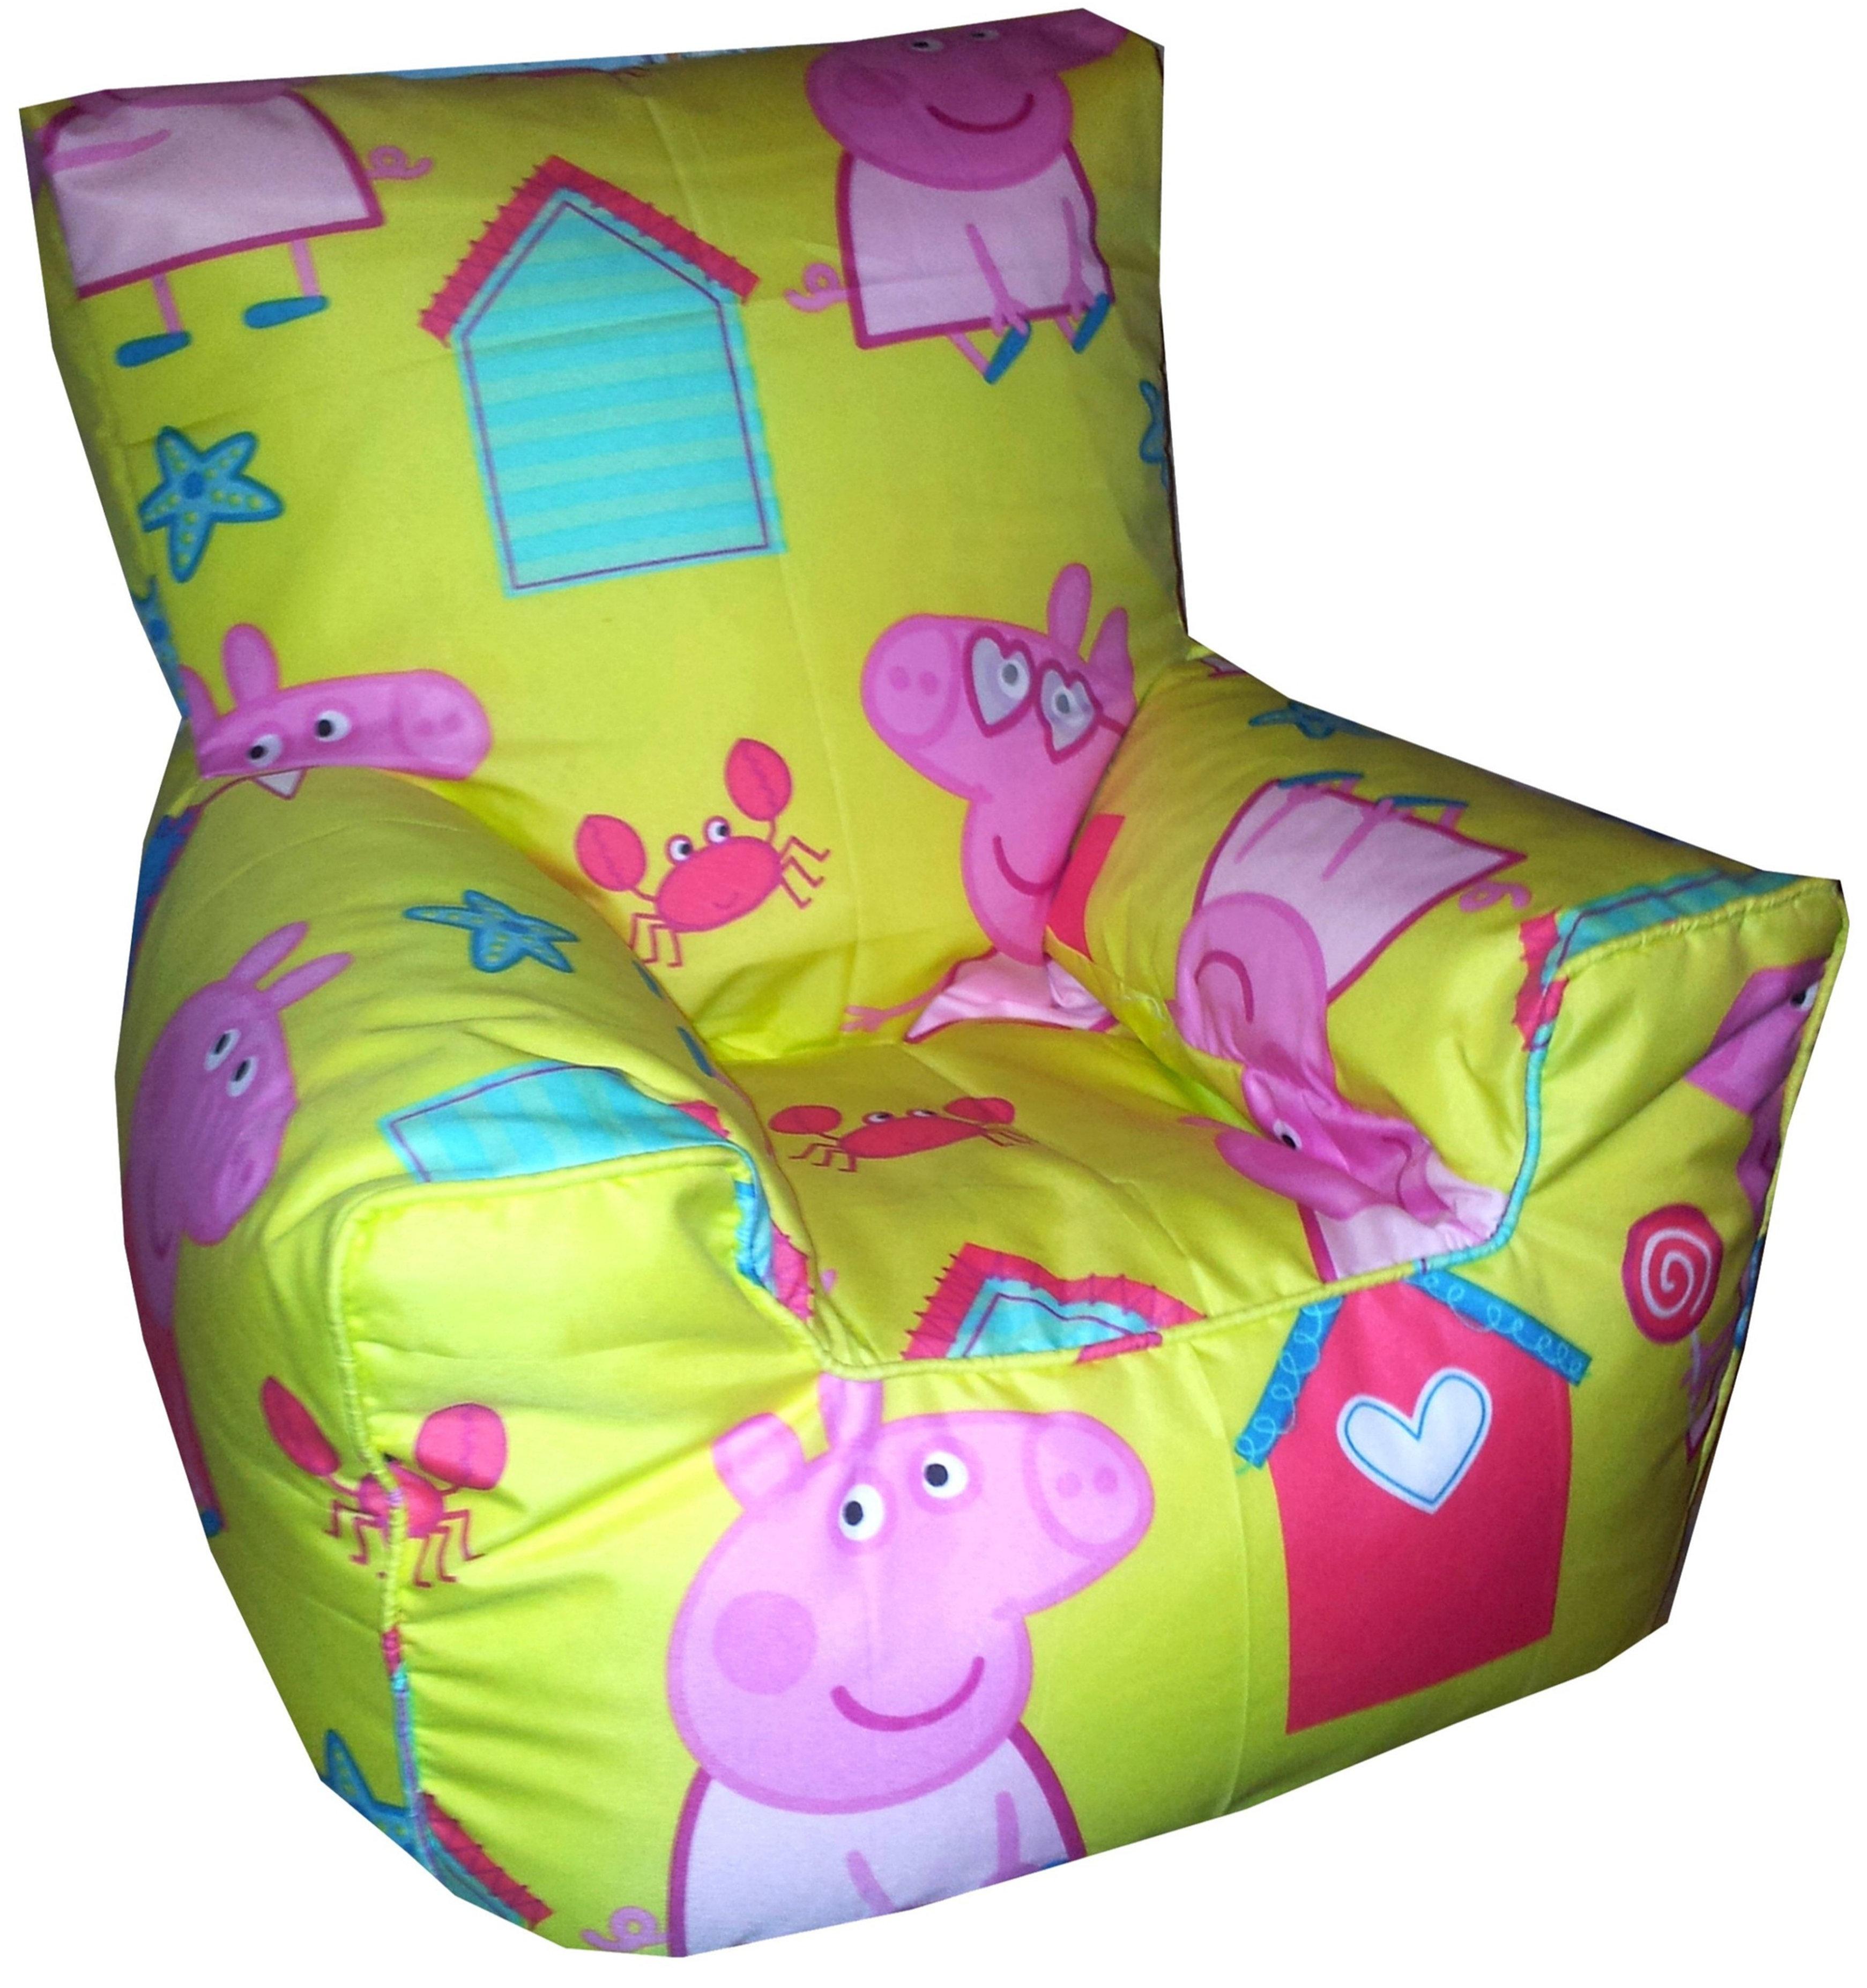 Peppa Pig Seaside Bean Bag Chair (Children's Kids Toddler)